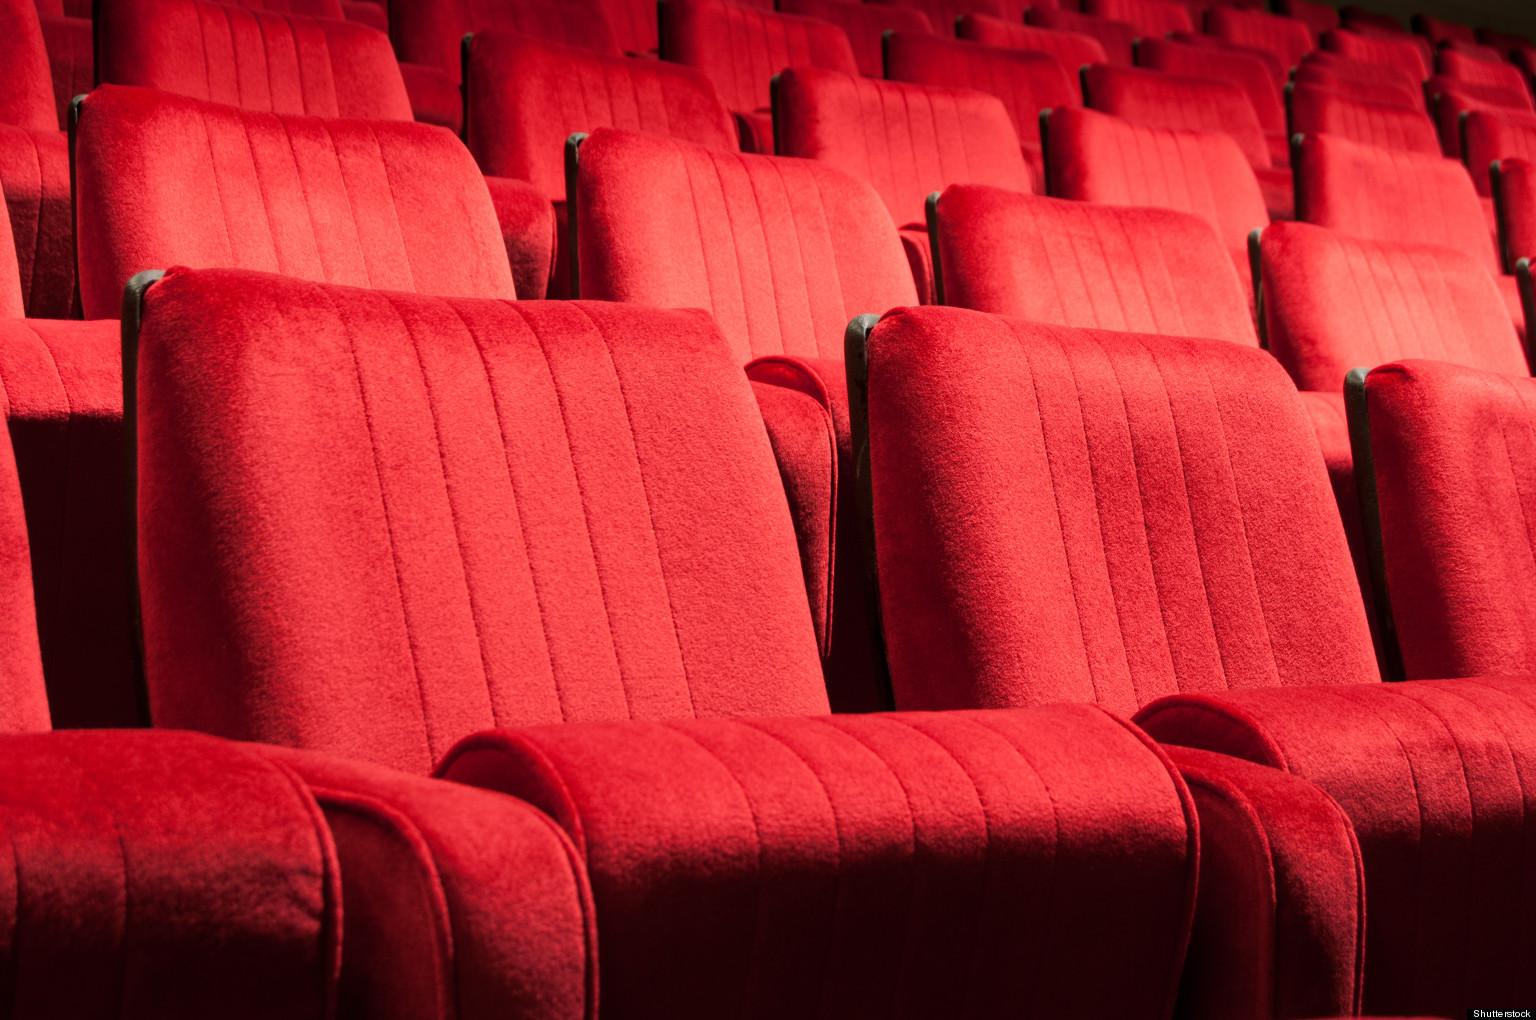 movie theatre seats used